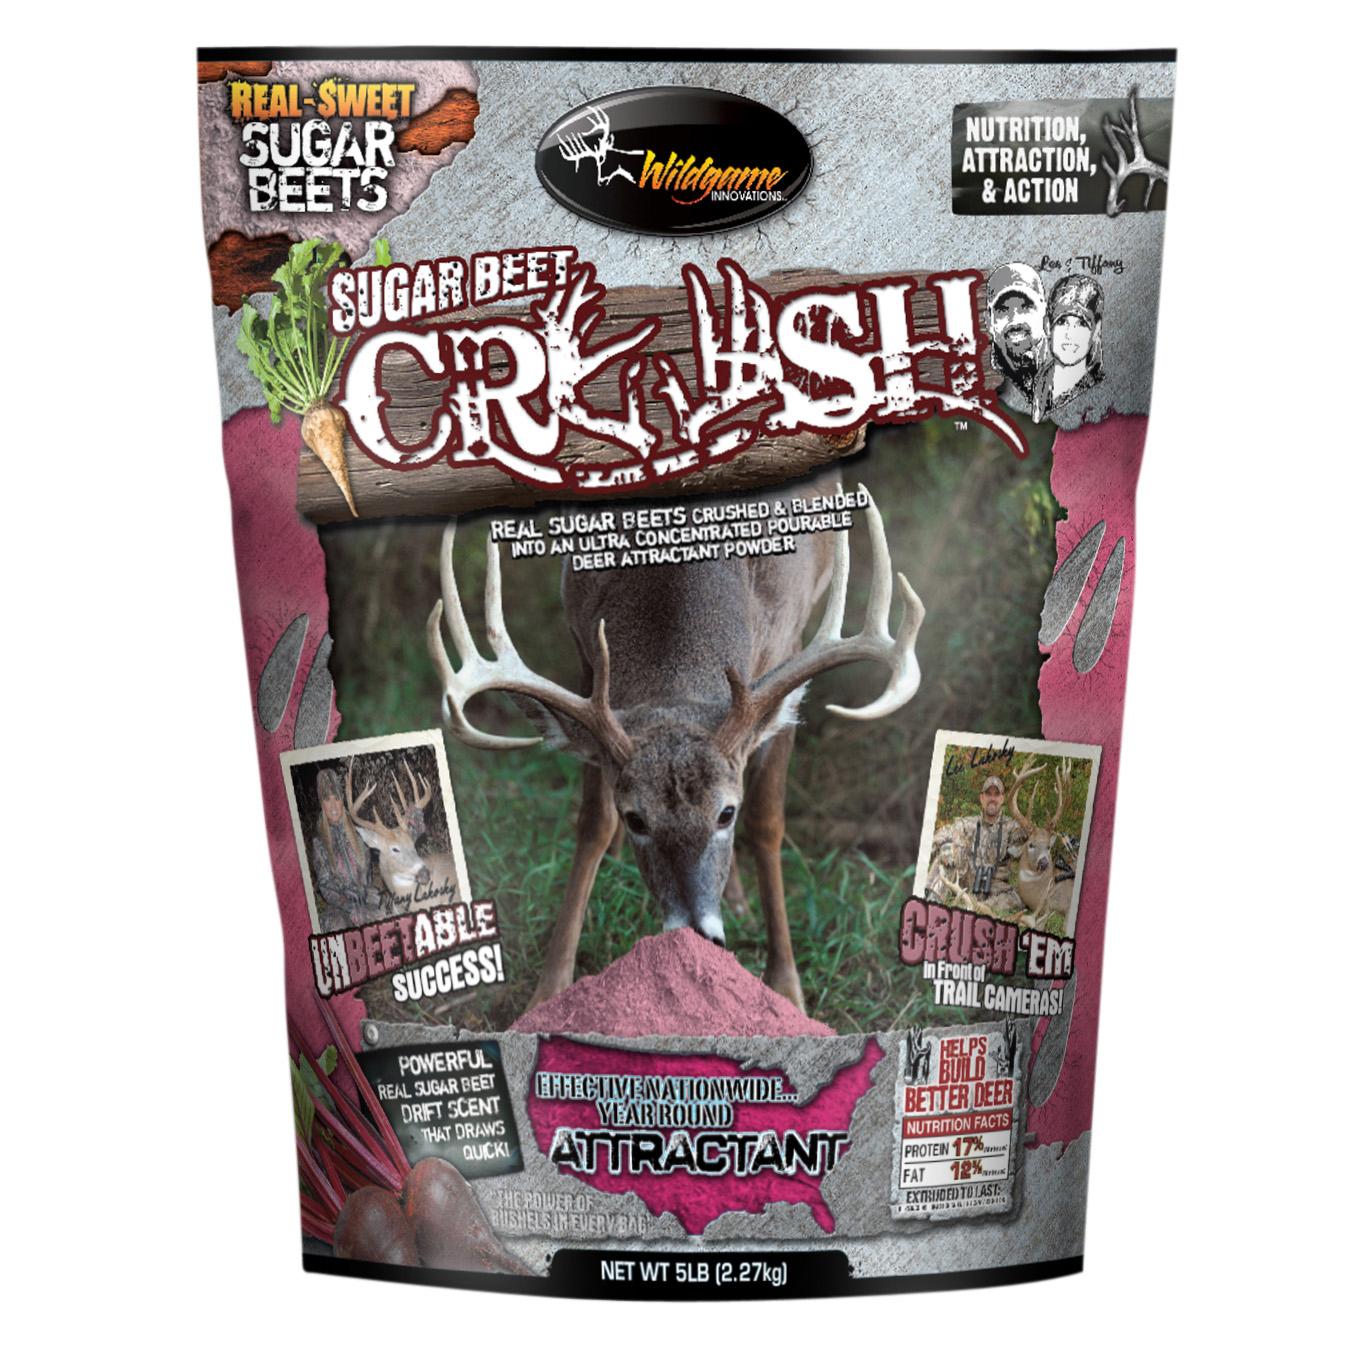 Wildgame Innovations Sugar Beet Crush Deer Attractant, 5 lbs.